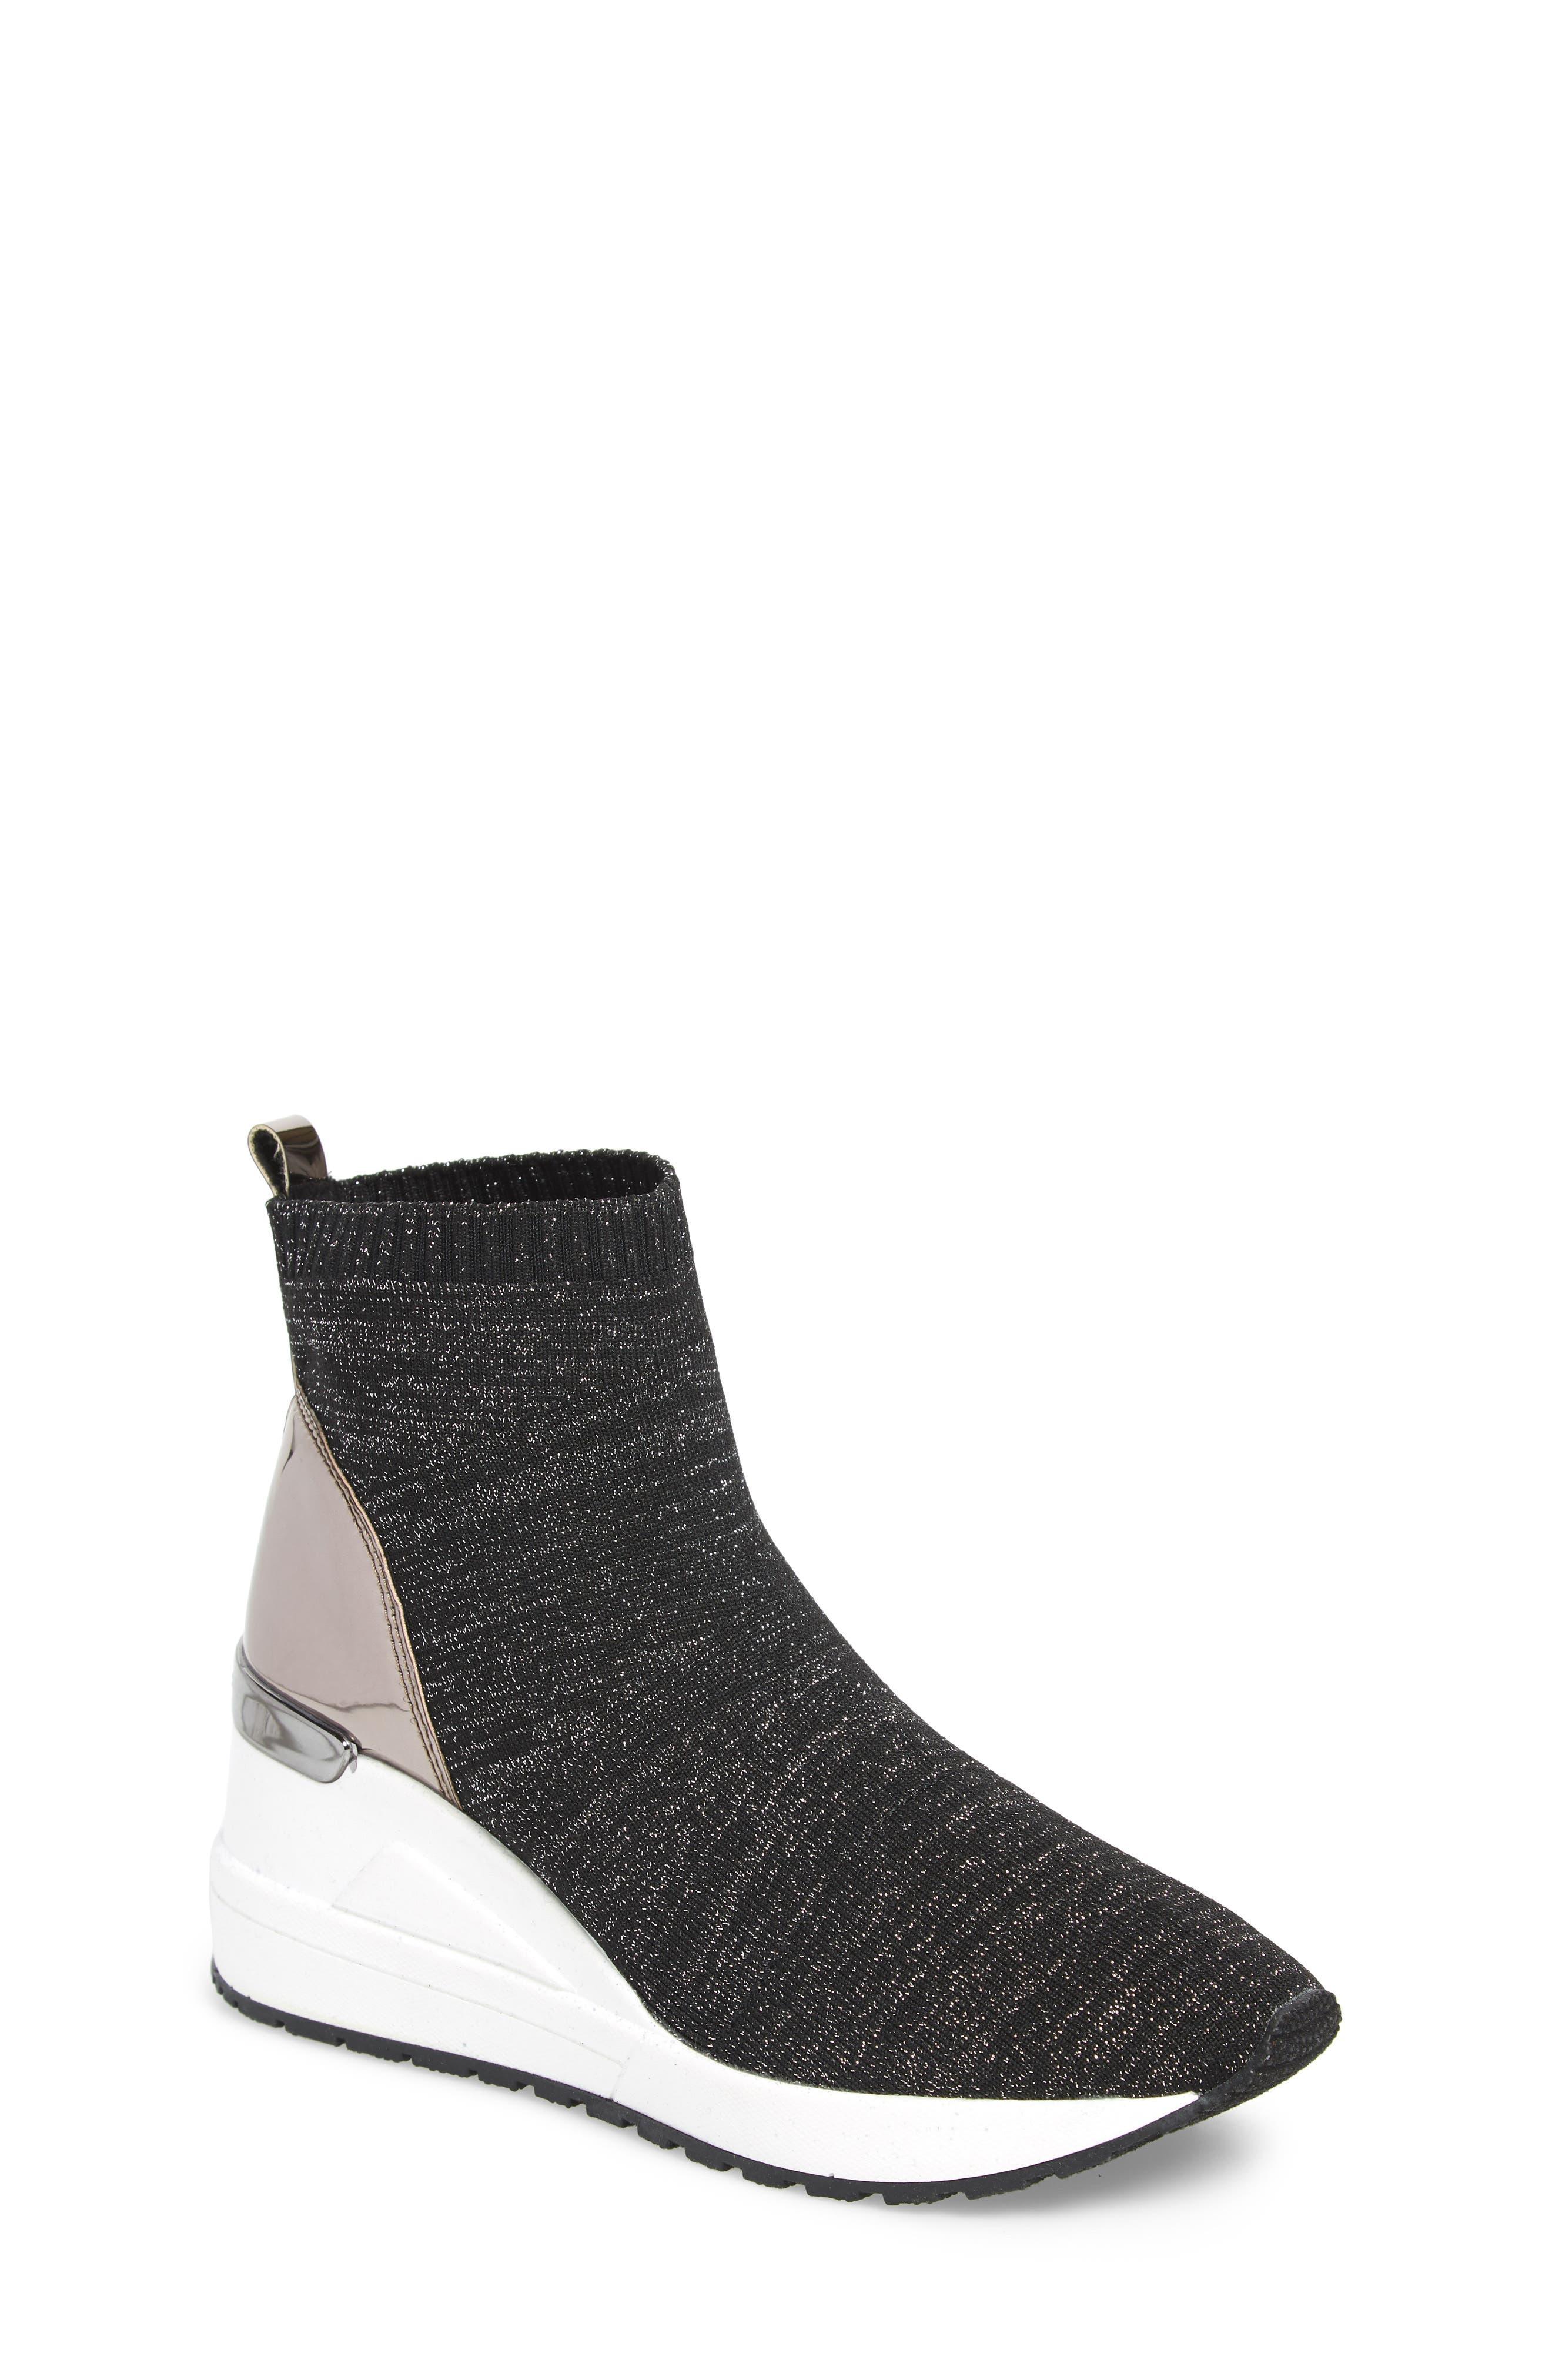 MICHAEL MICHAEL KORS Neo Flex Metallic Wedge Sneaker, Main, color, BLACK METALLIC